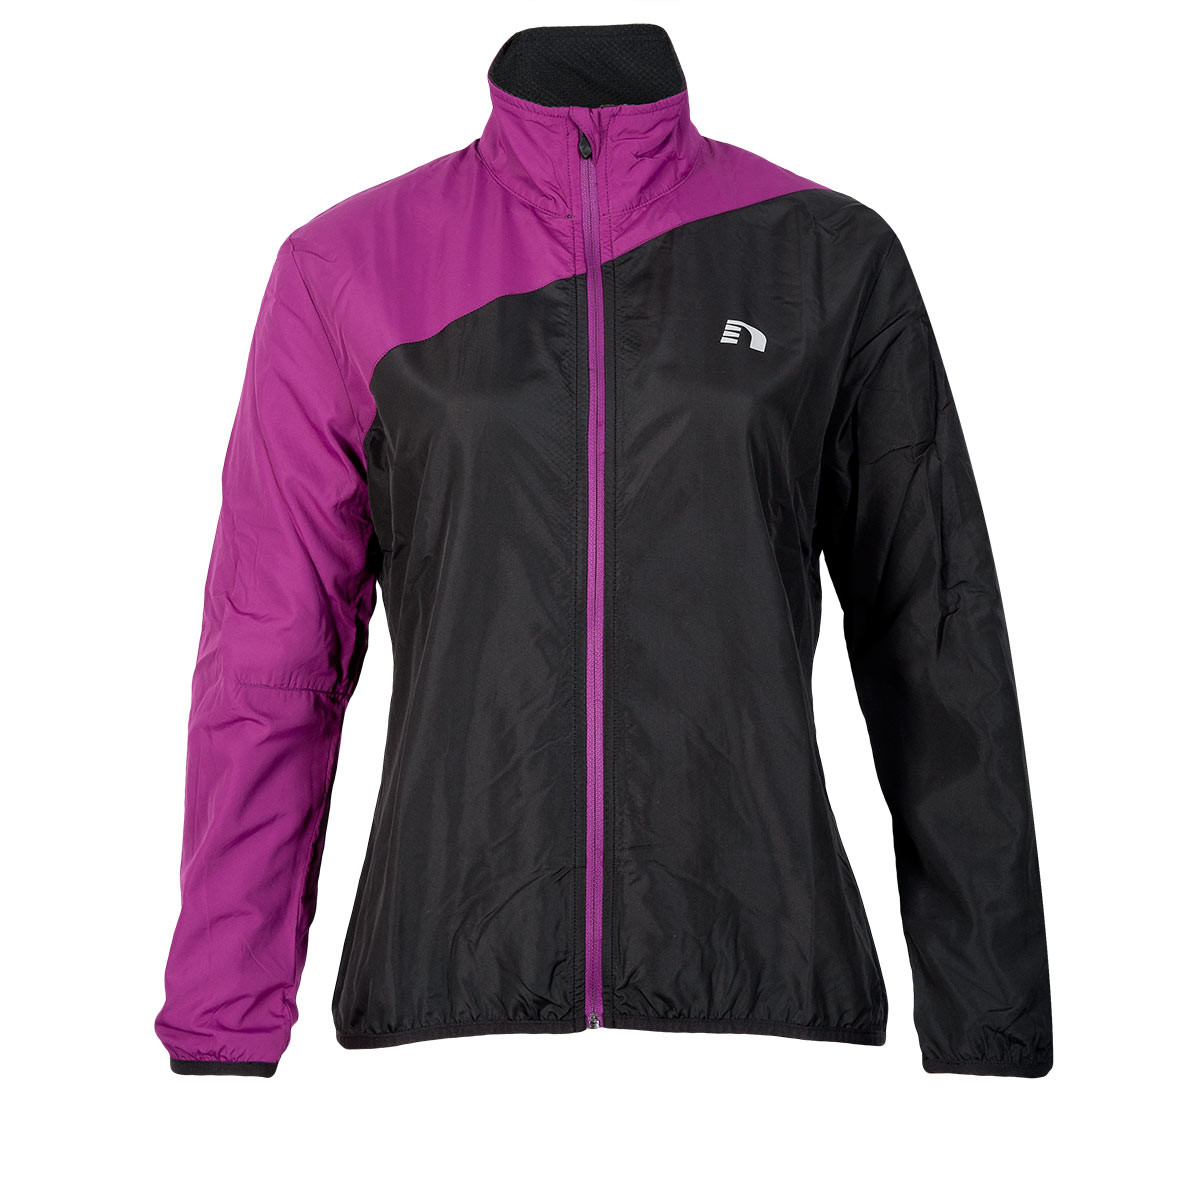 cd877b3bb32 Newline Warm Jacket - Running jackets for Women - Black